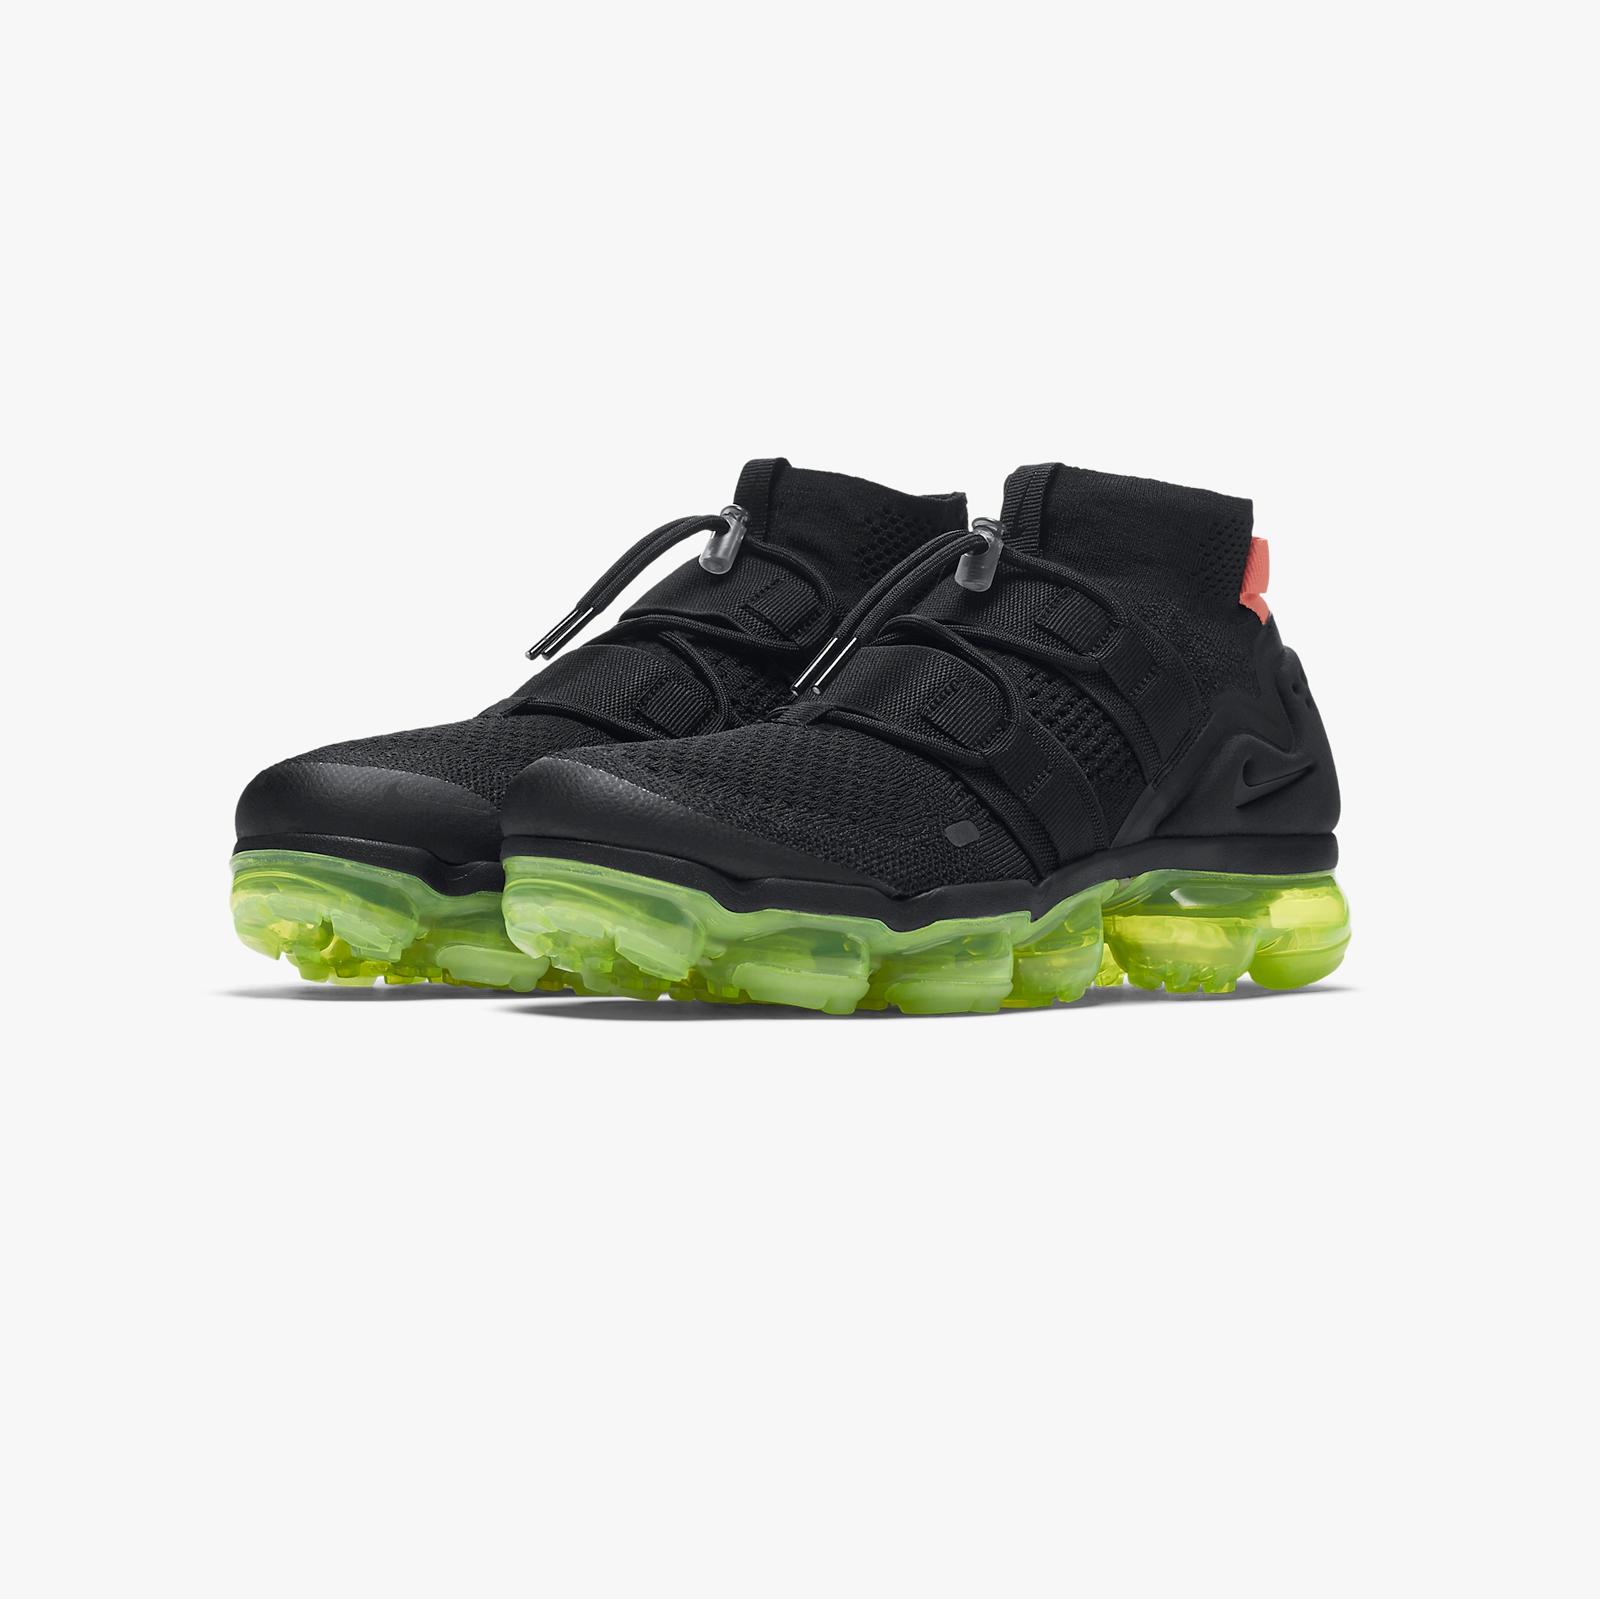 2ab8934f8a Nike Air Vapormax Flyknit Utility - Ah6834-007 - Sneakersnstuff | sneakers  & streetwear på nätet sen 1999